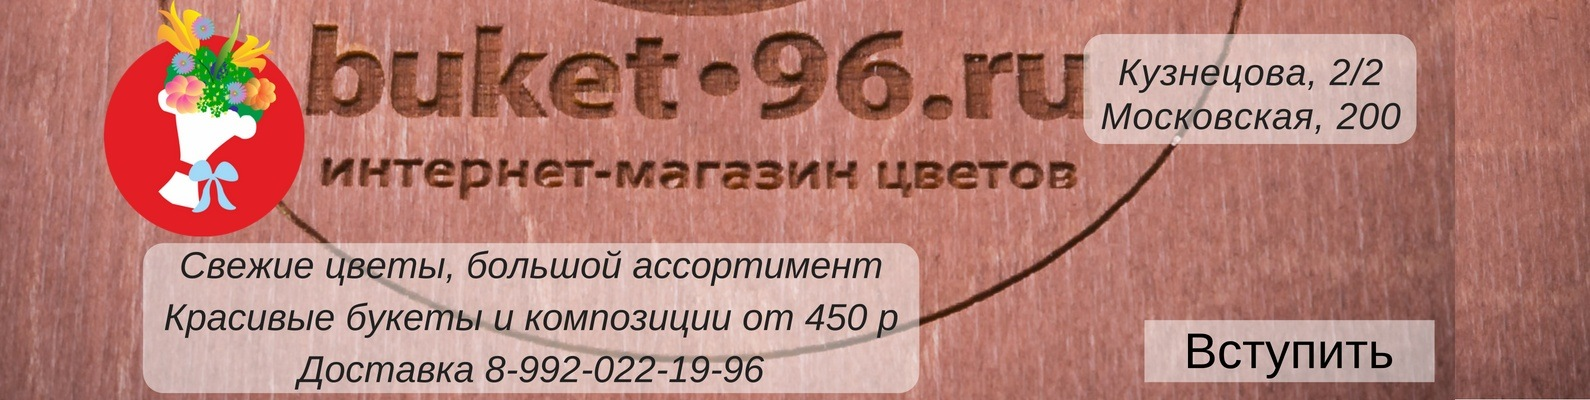 magazin-tsvetov-avtovokzal-ekaterinburg-tsveti-v-samare-dostavka